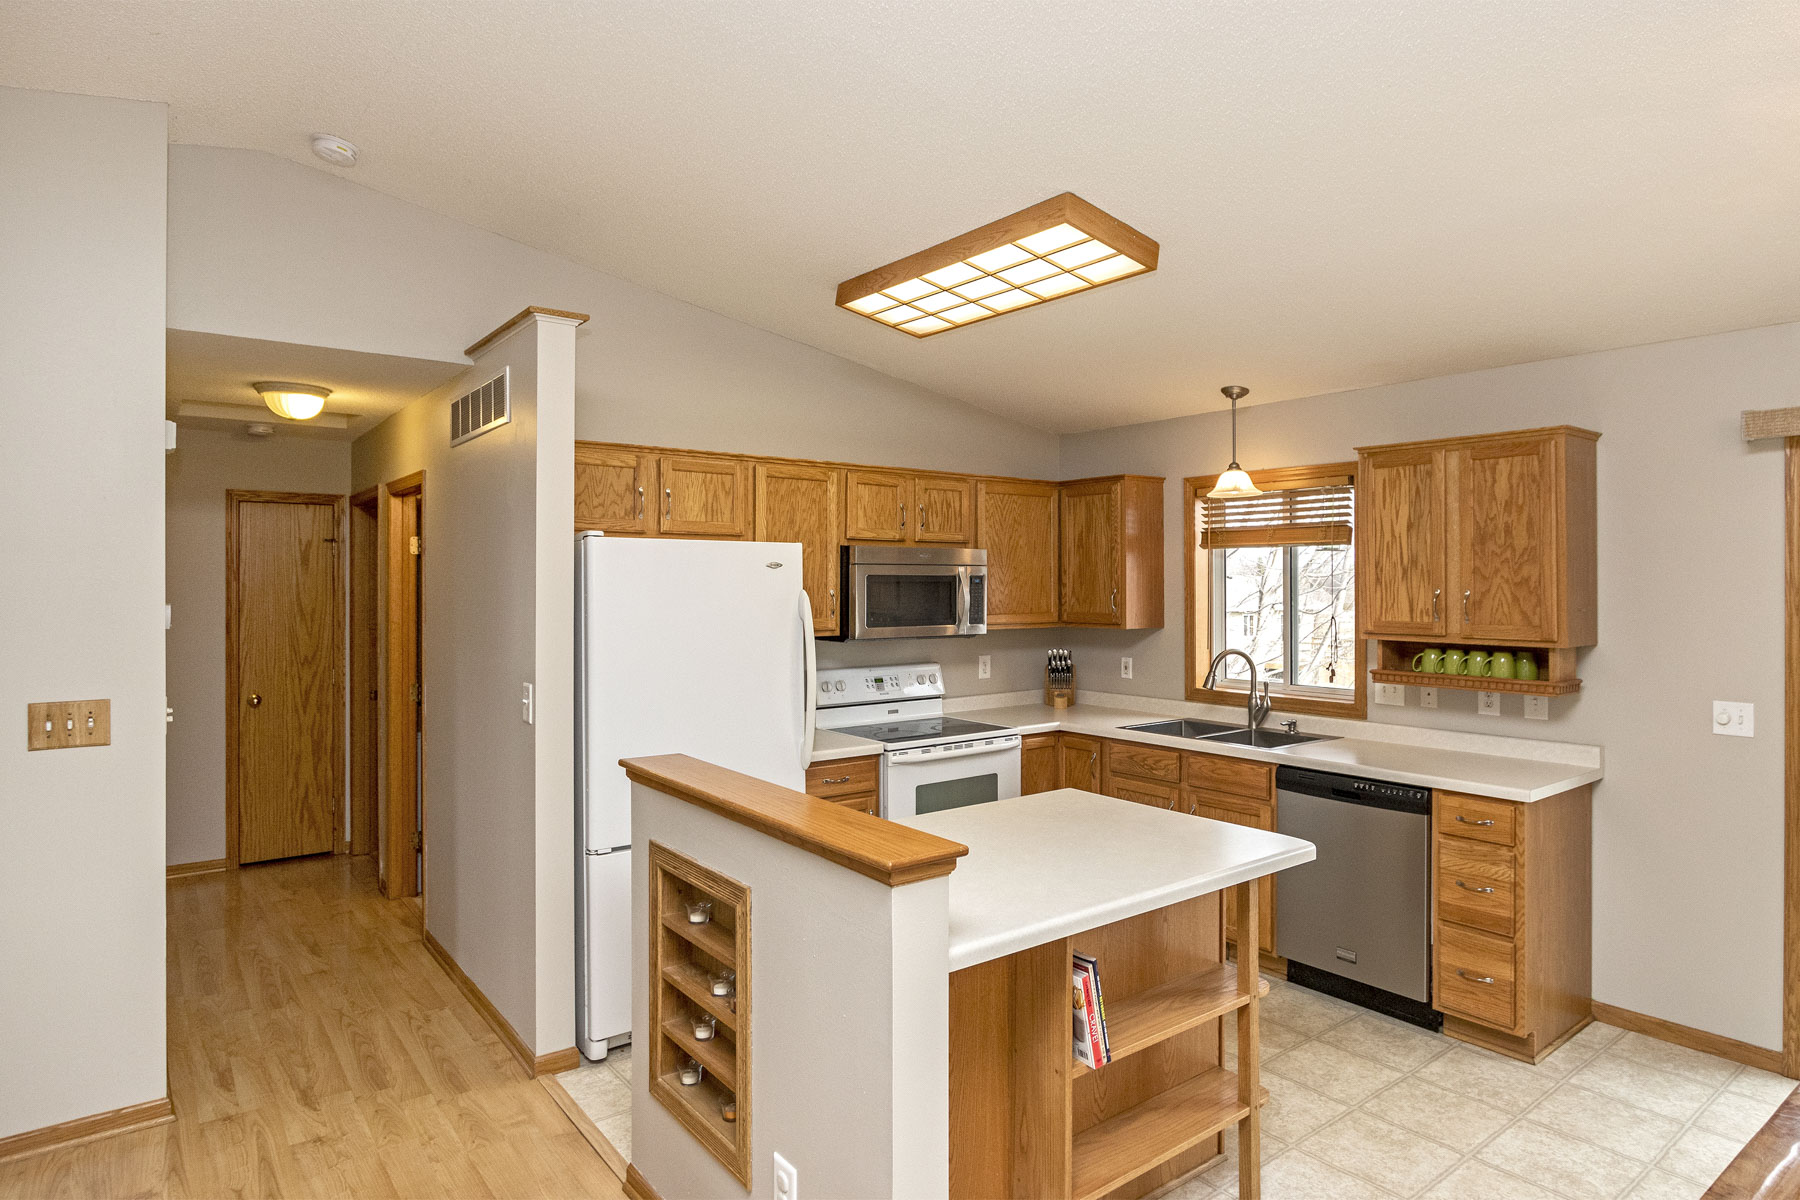 Kitchen - 414 8th st nw dodge center